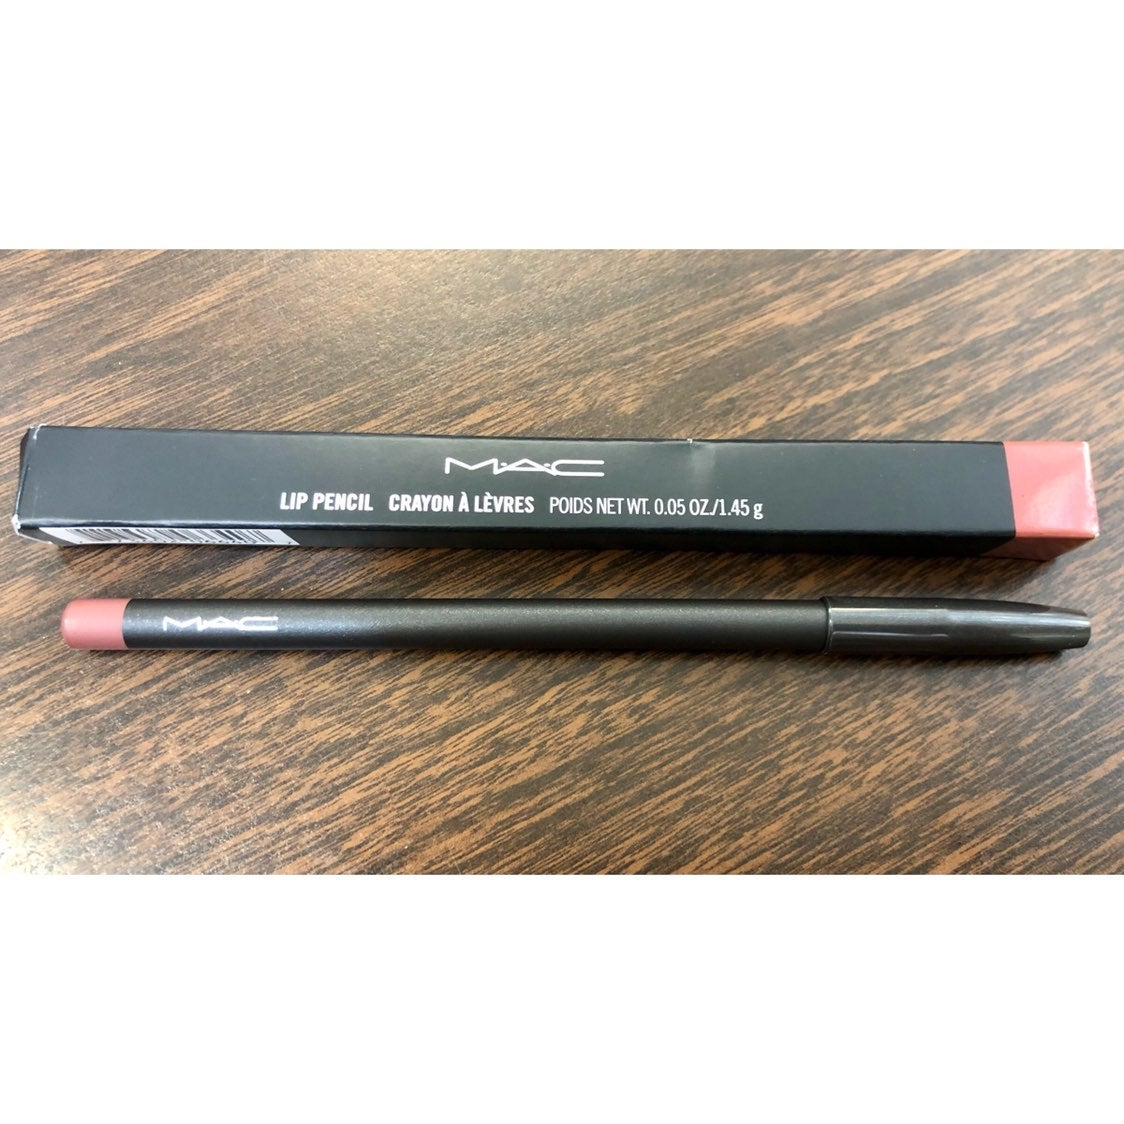 MAC Lip Pencil in Whril, BNIB